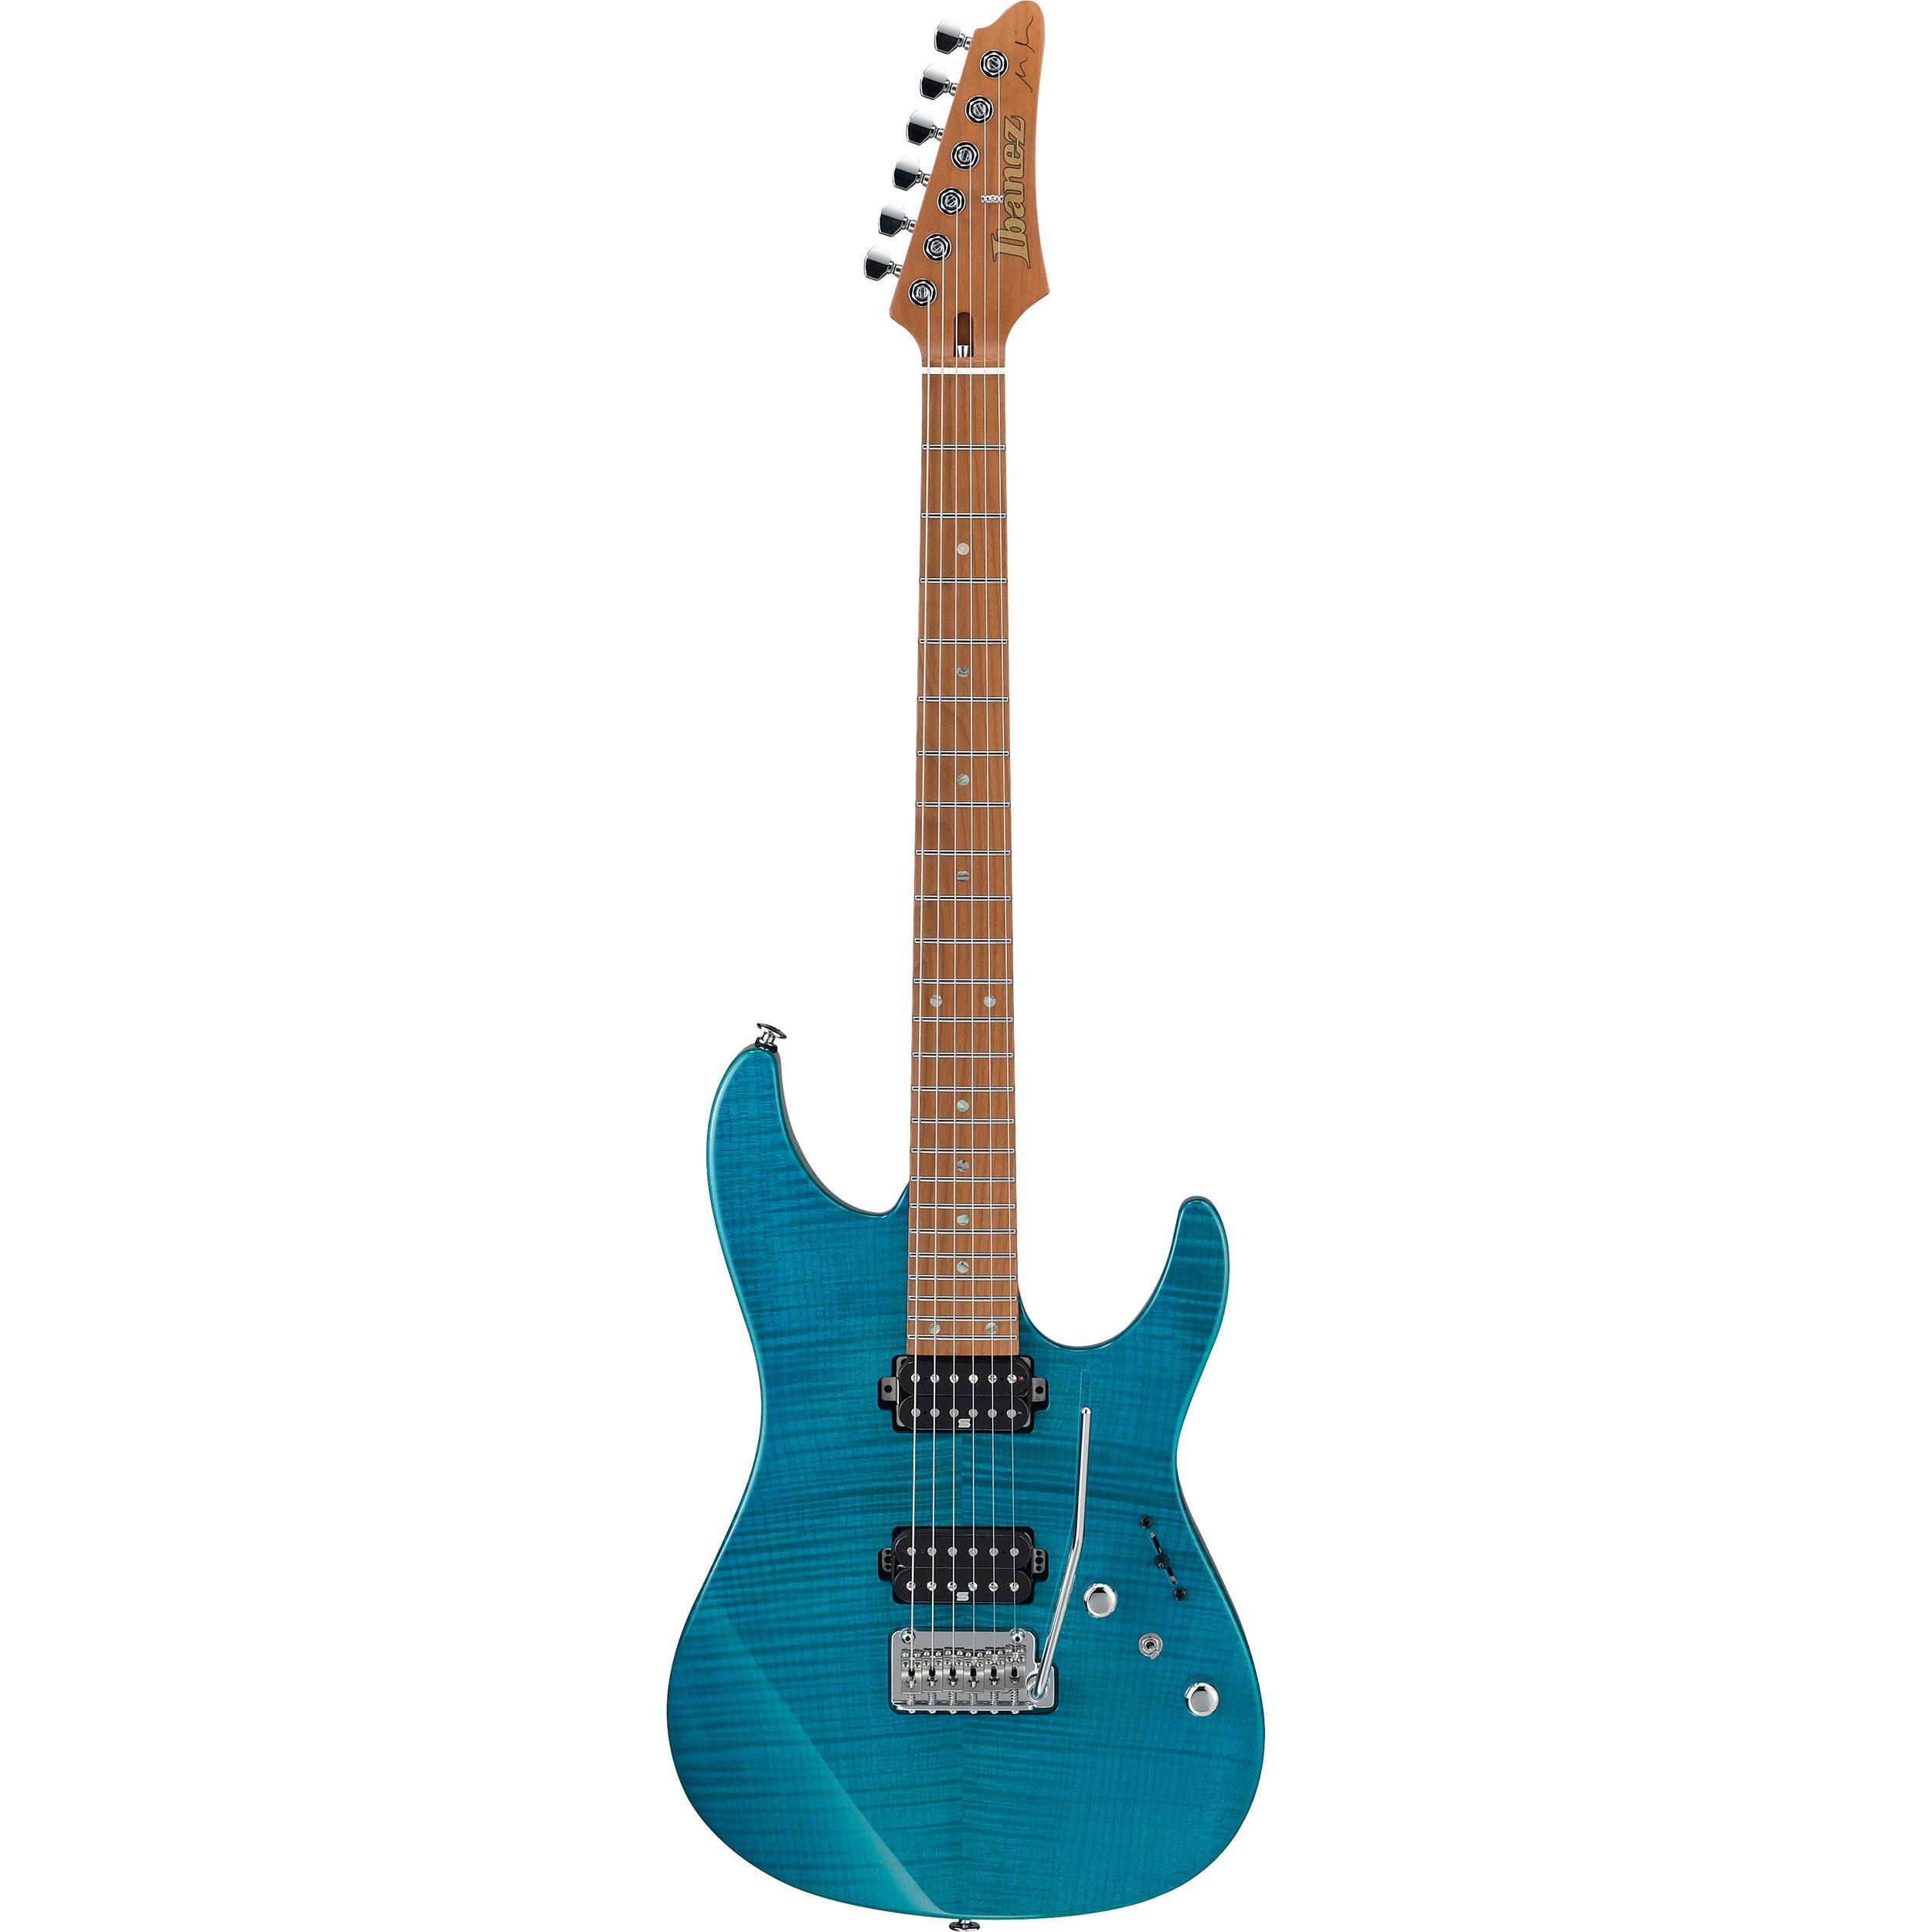 Aqua Blue Electric Guitar Not Lossing Wiring Diagram Signature Fender Strat Diagrams Ibanez Mm1 Martin Miller Series Leopard Light